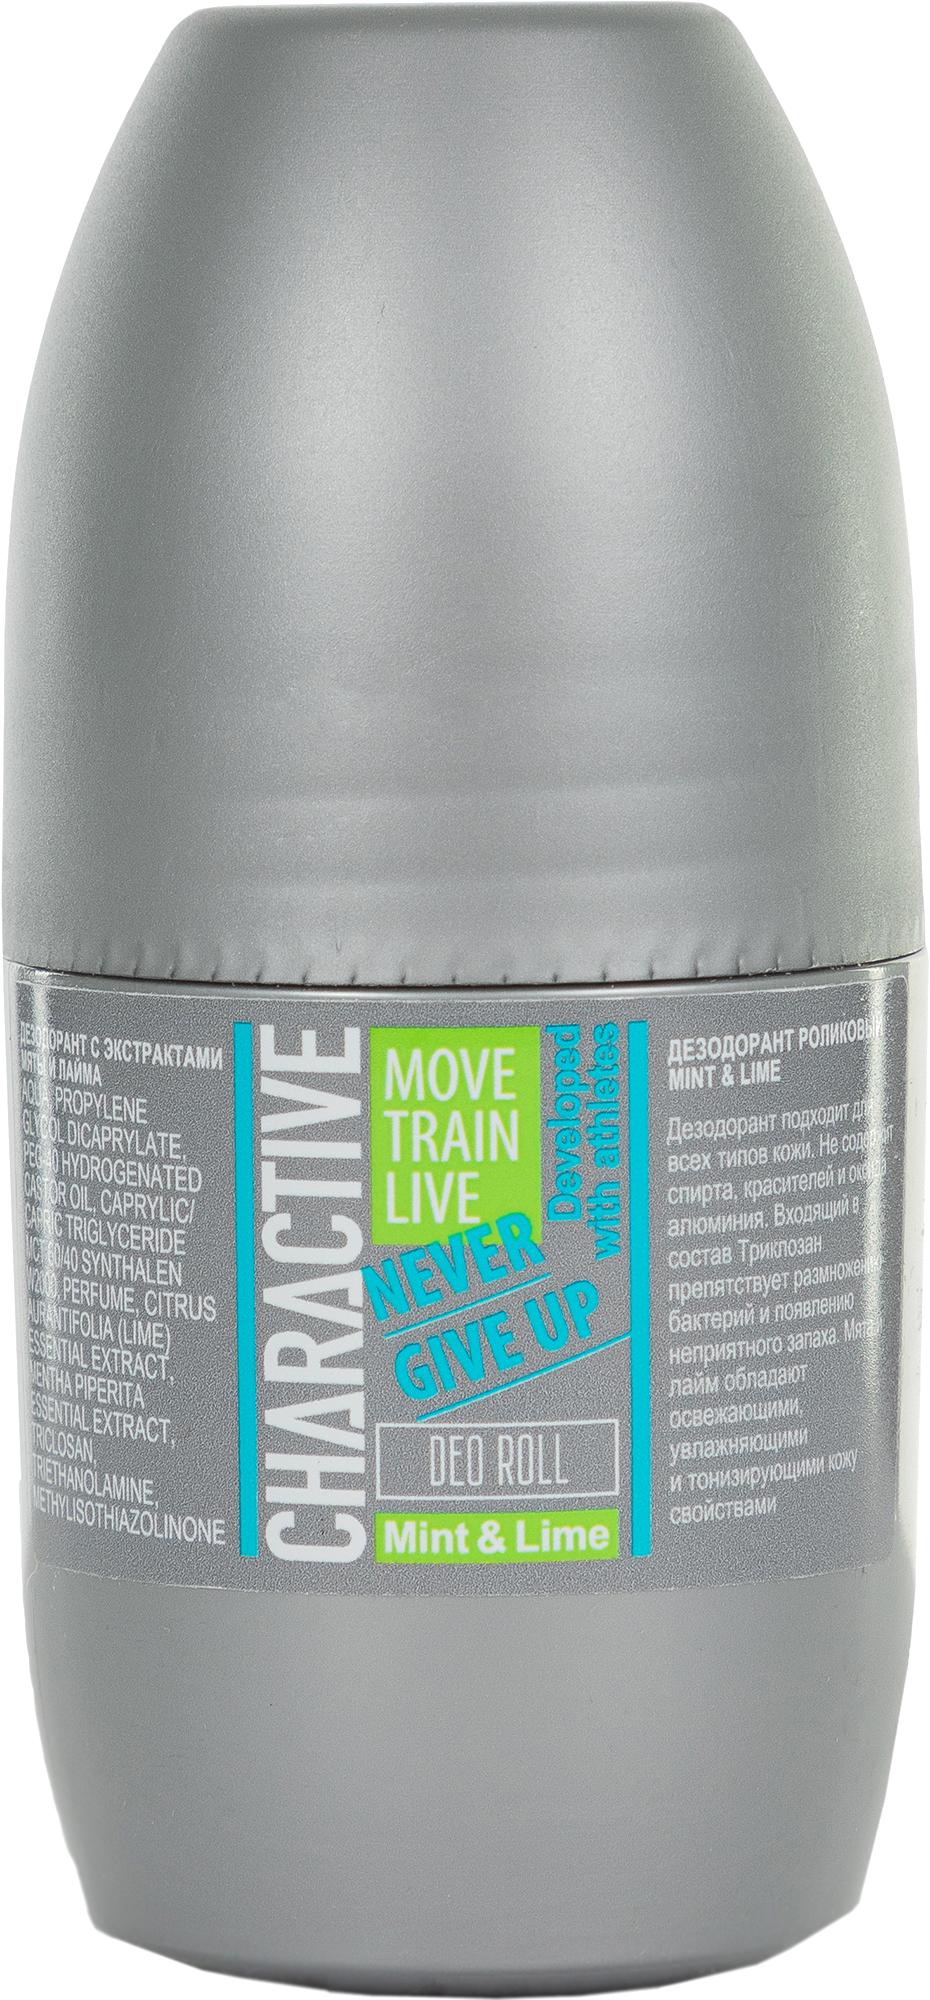 Charactive Дезодорант роликовый Mint & Lime